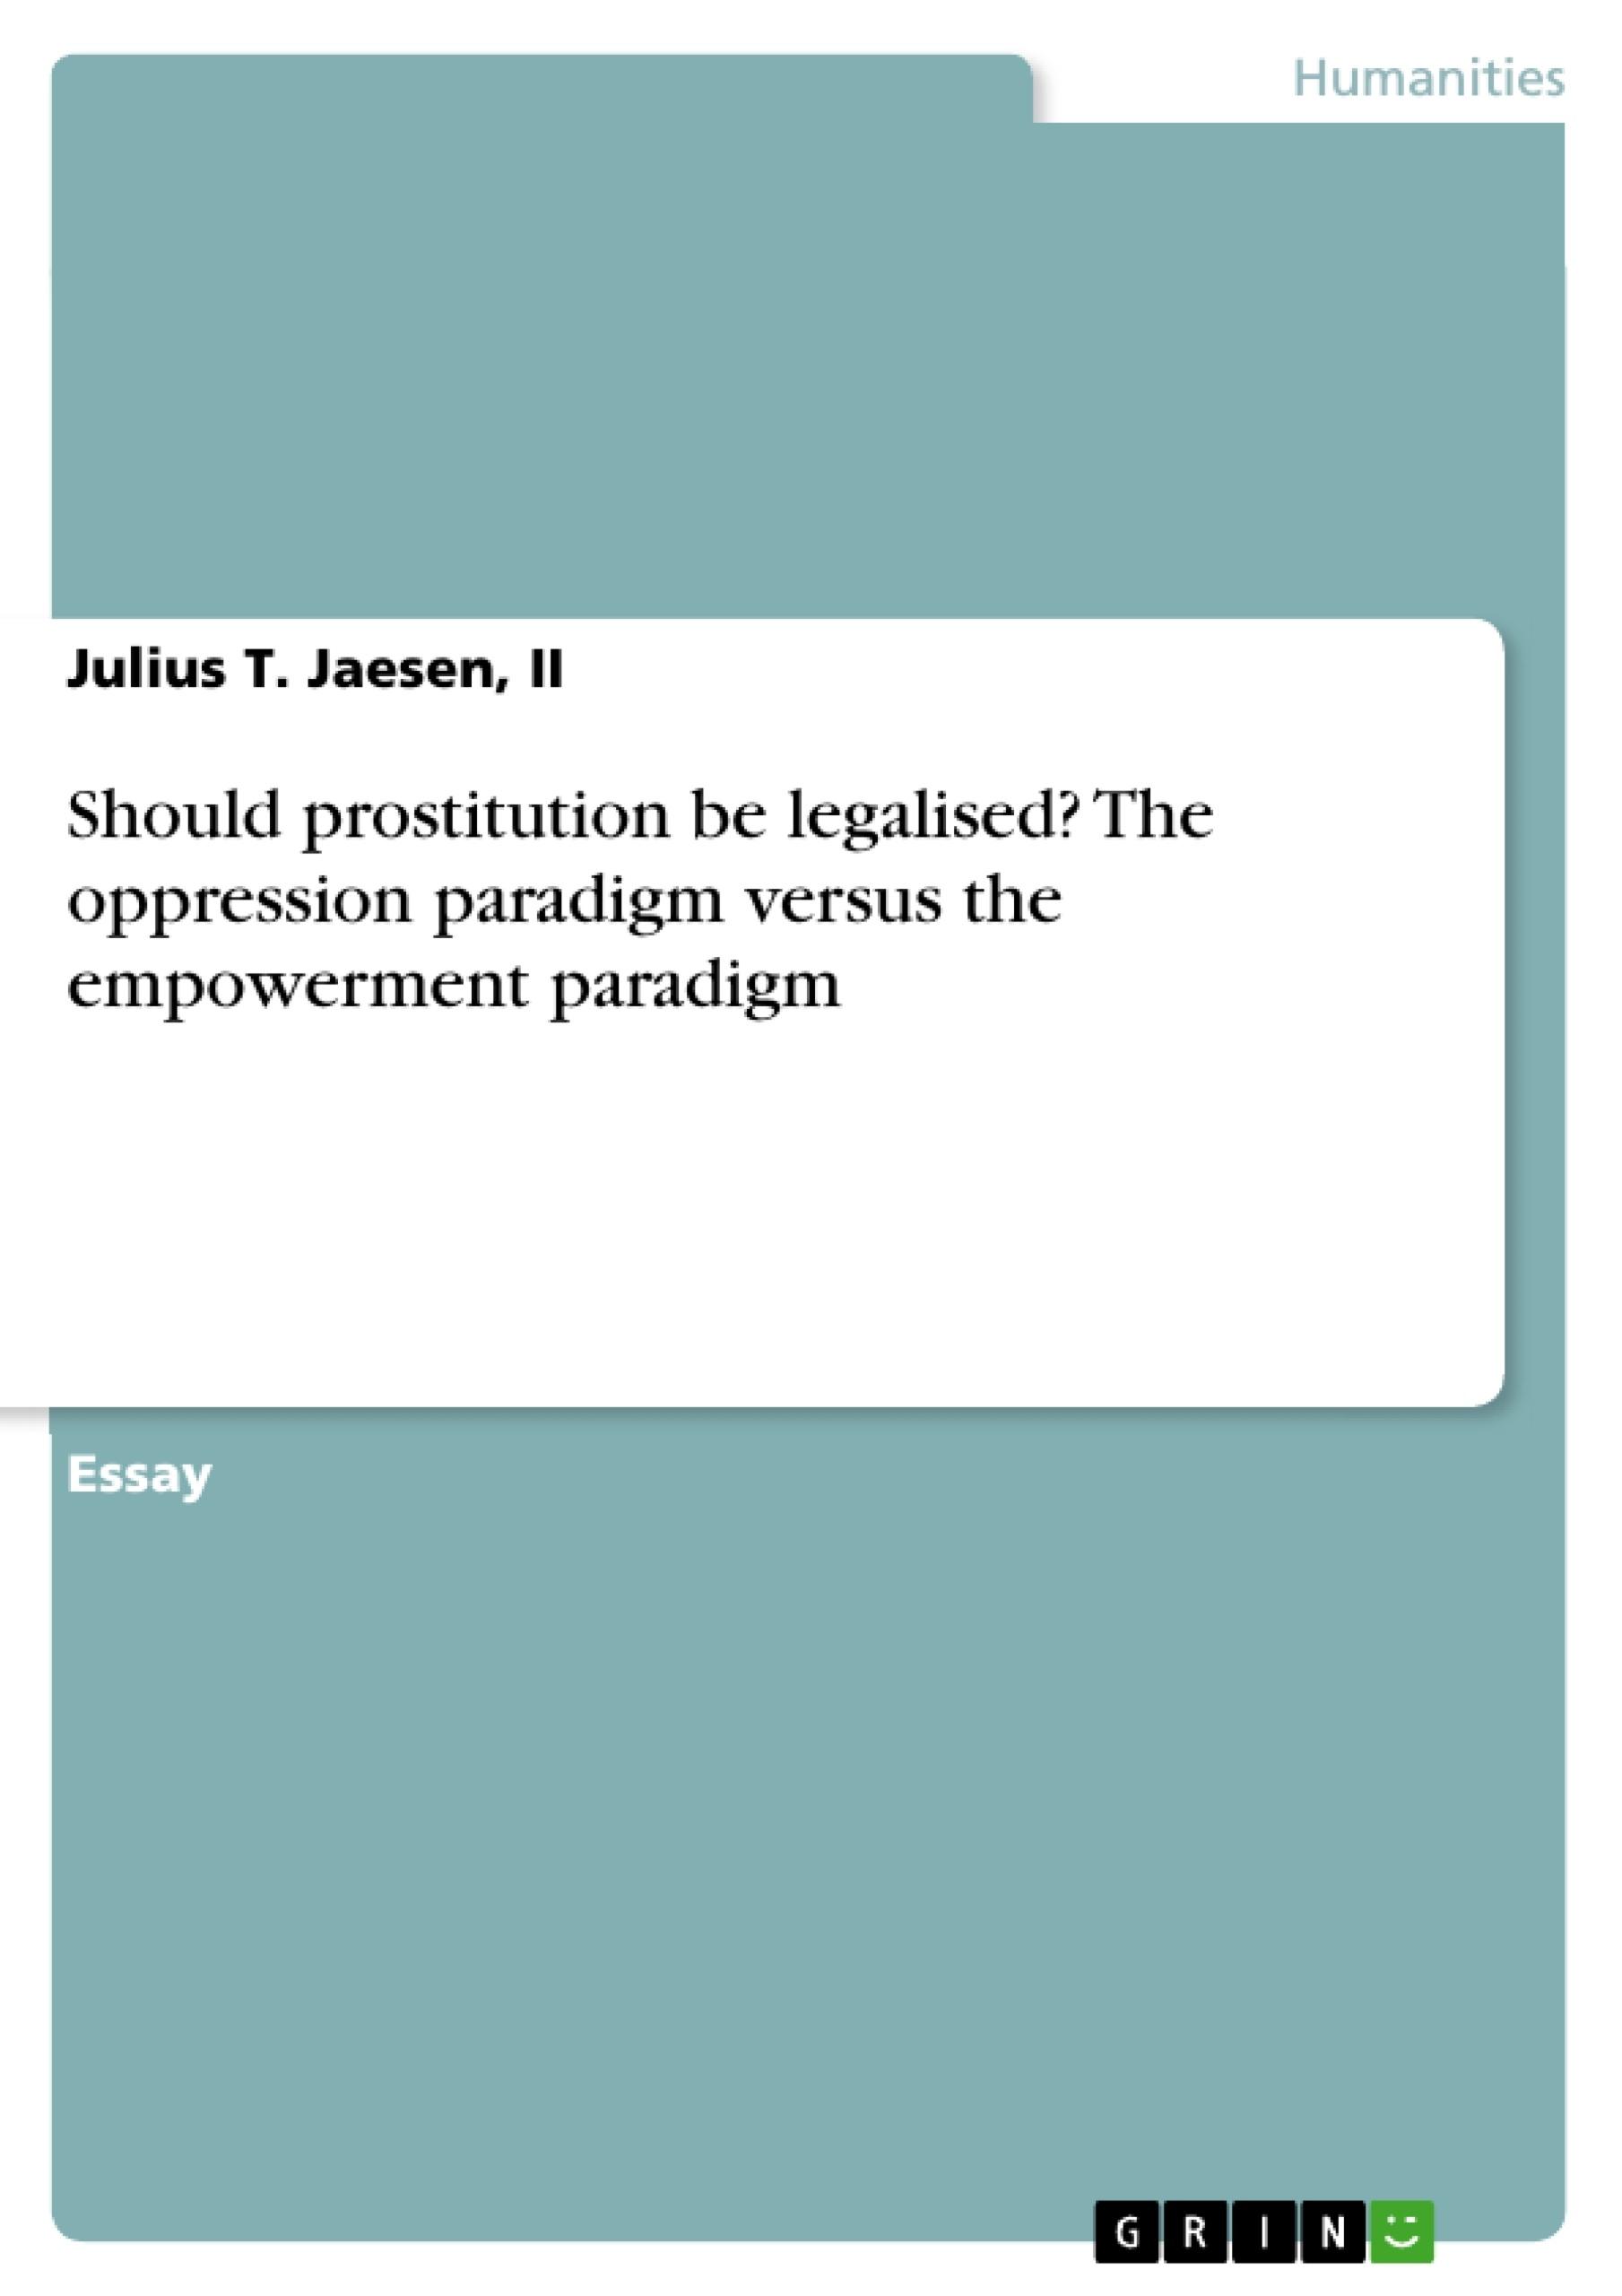 Title: Should prostitution be legalised? The oppression paradigm versus the empowerment paradigm